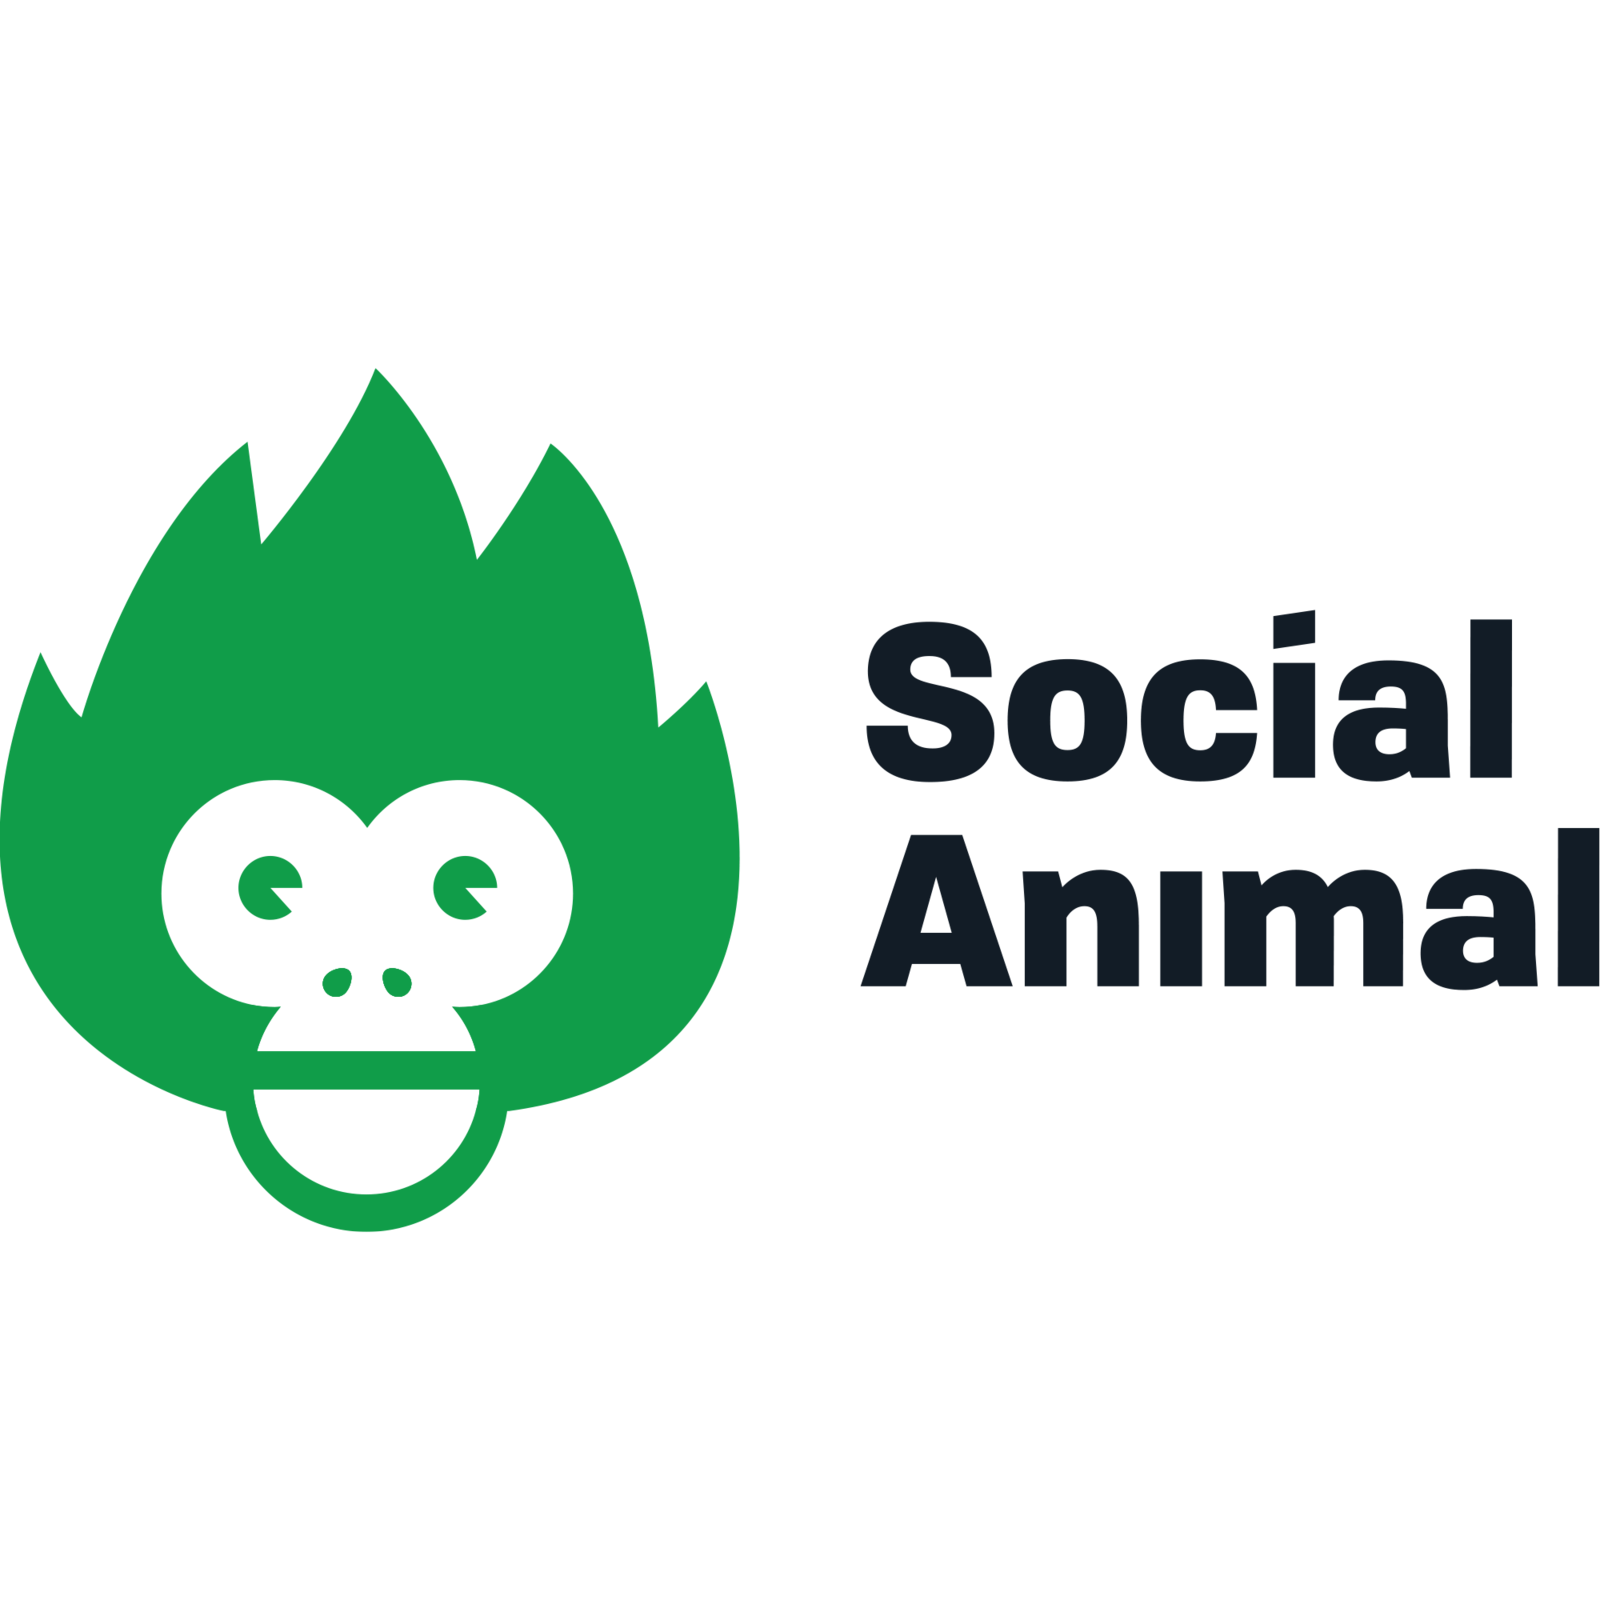 Social Animal Support